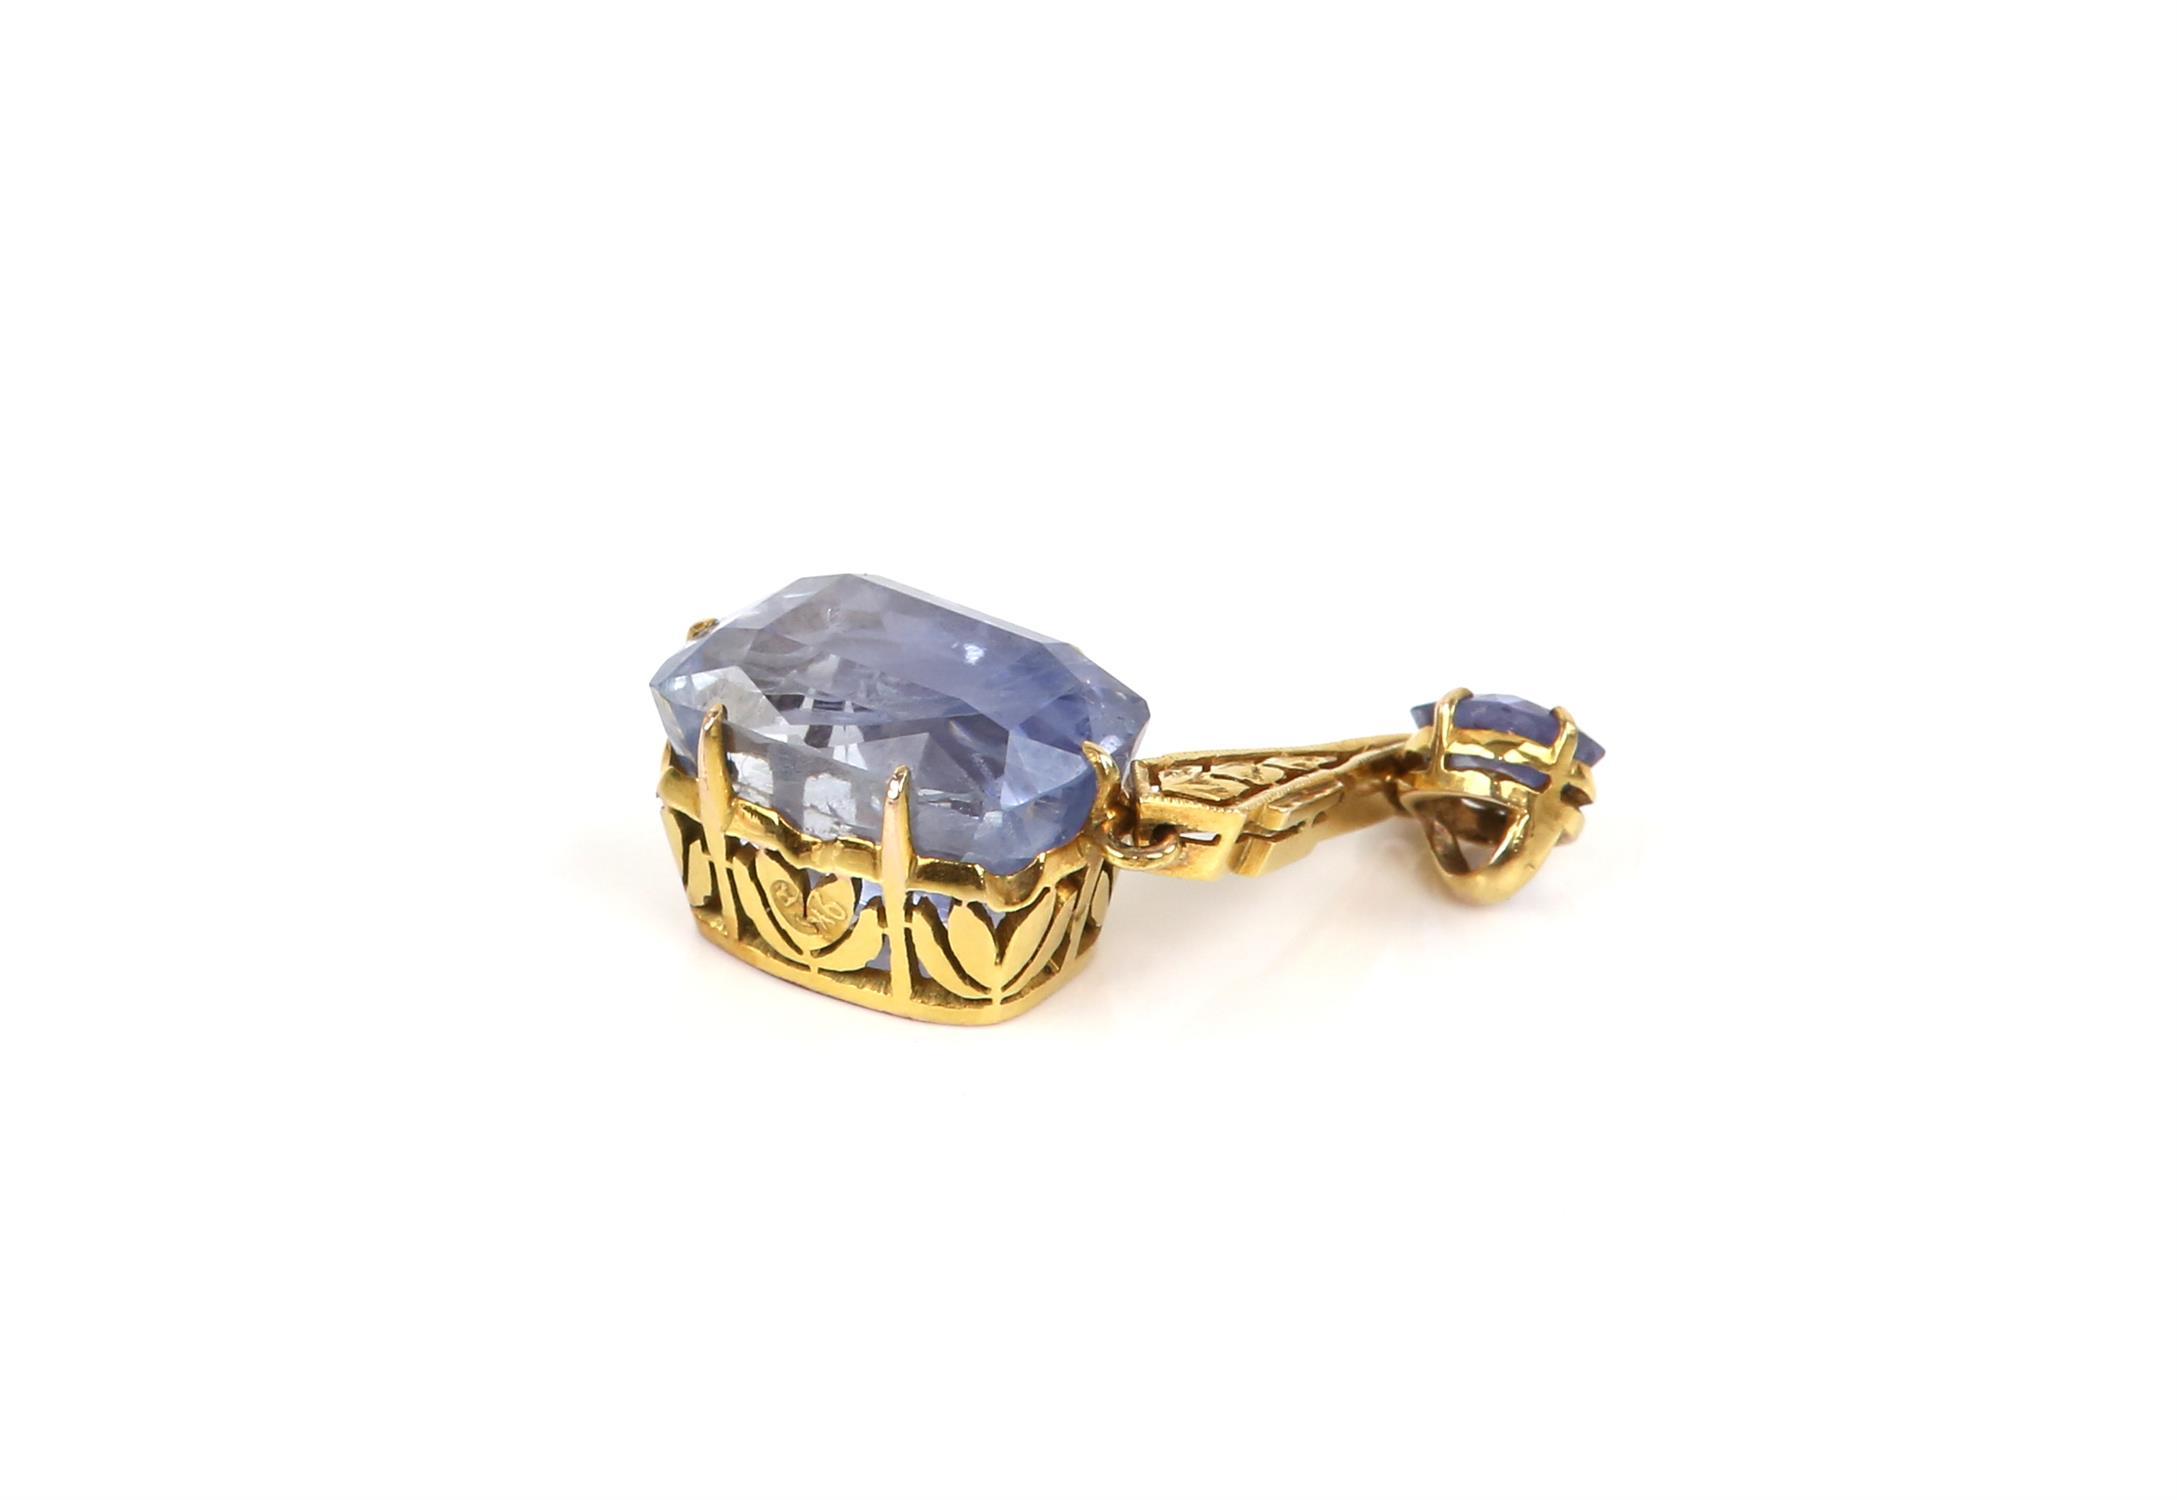 Sapphire drop pendant, principal light blue sapphire, estimated weight 12.99 carats, - Image 6 of 8